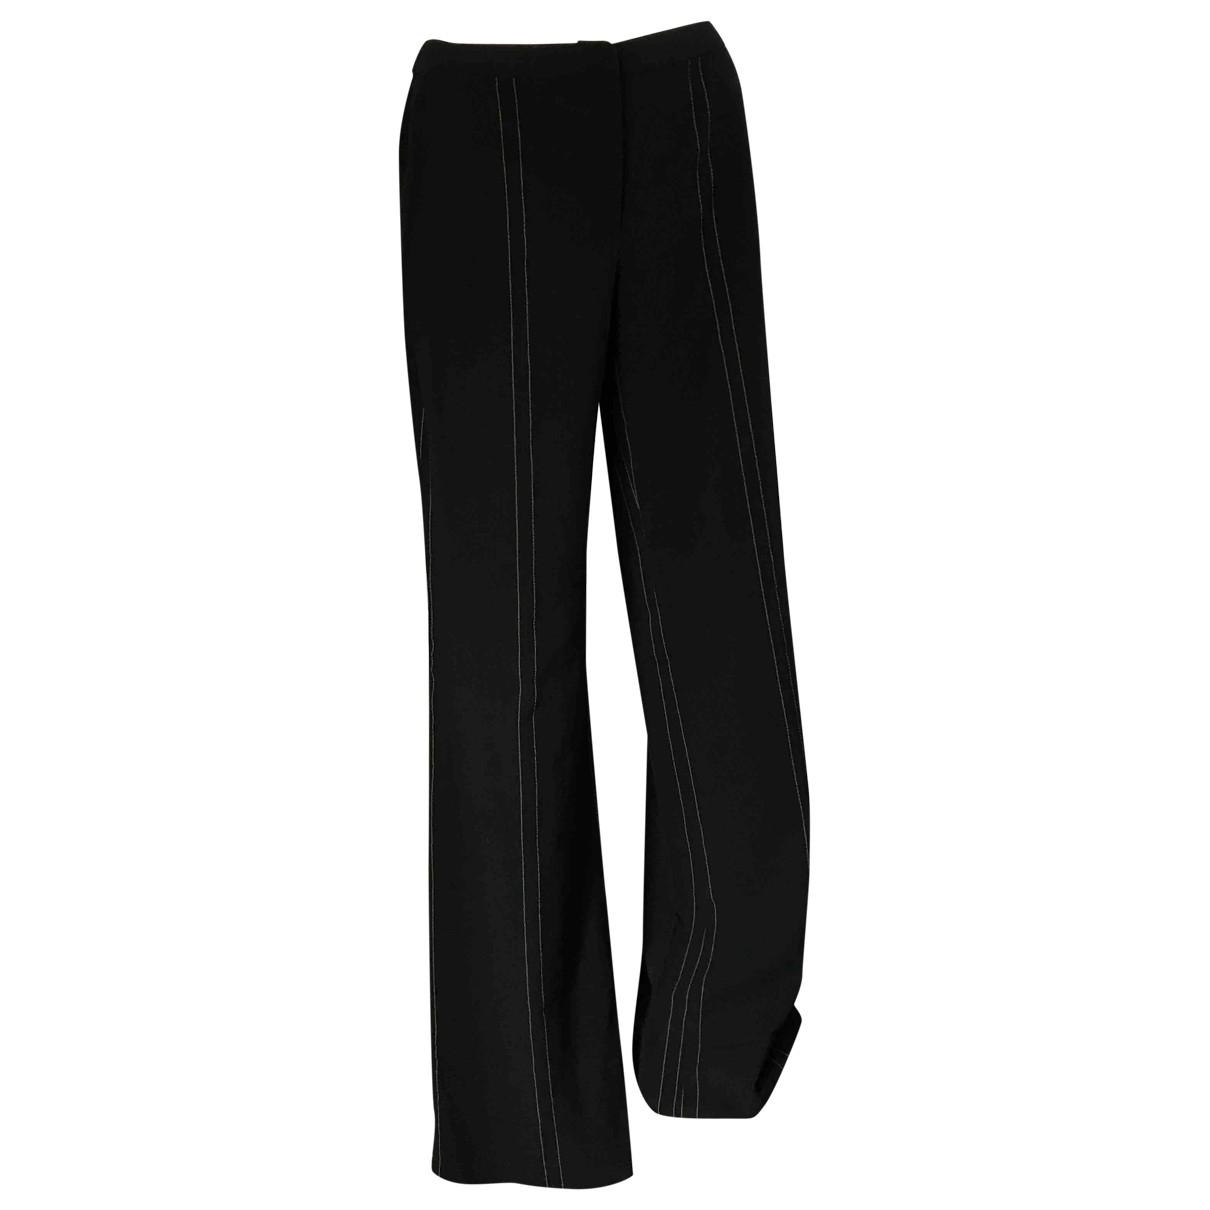 Pantalon de Lana Gianni Versace